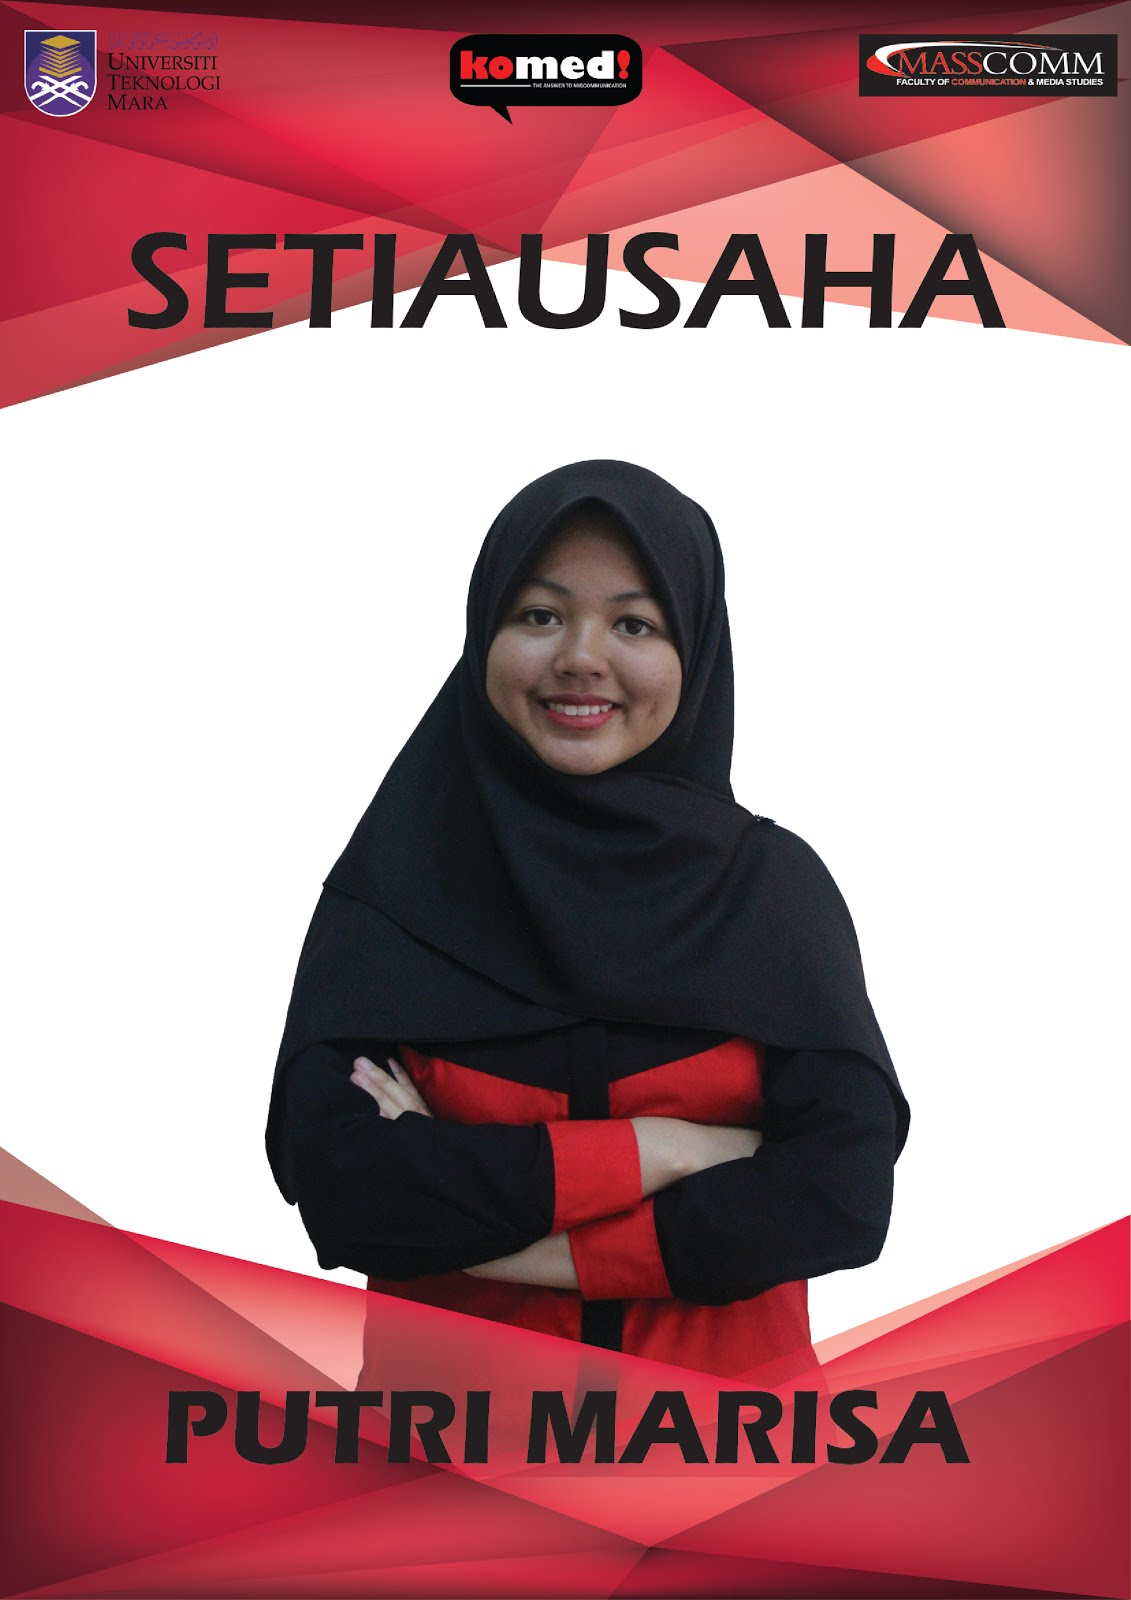 SETIAUSAHA